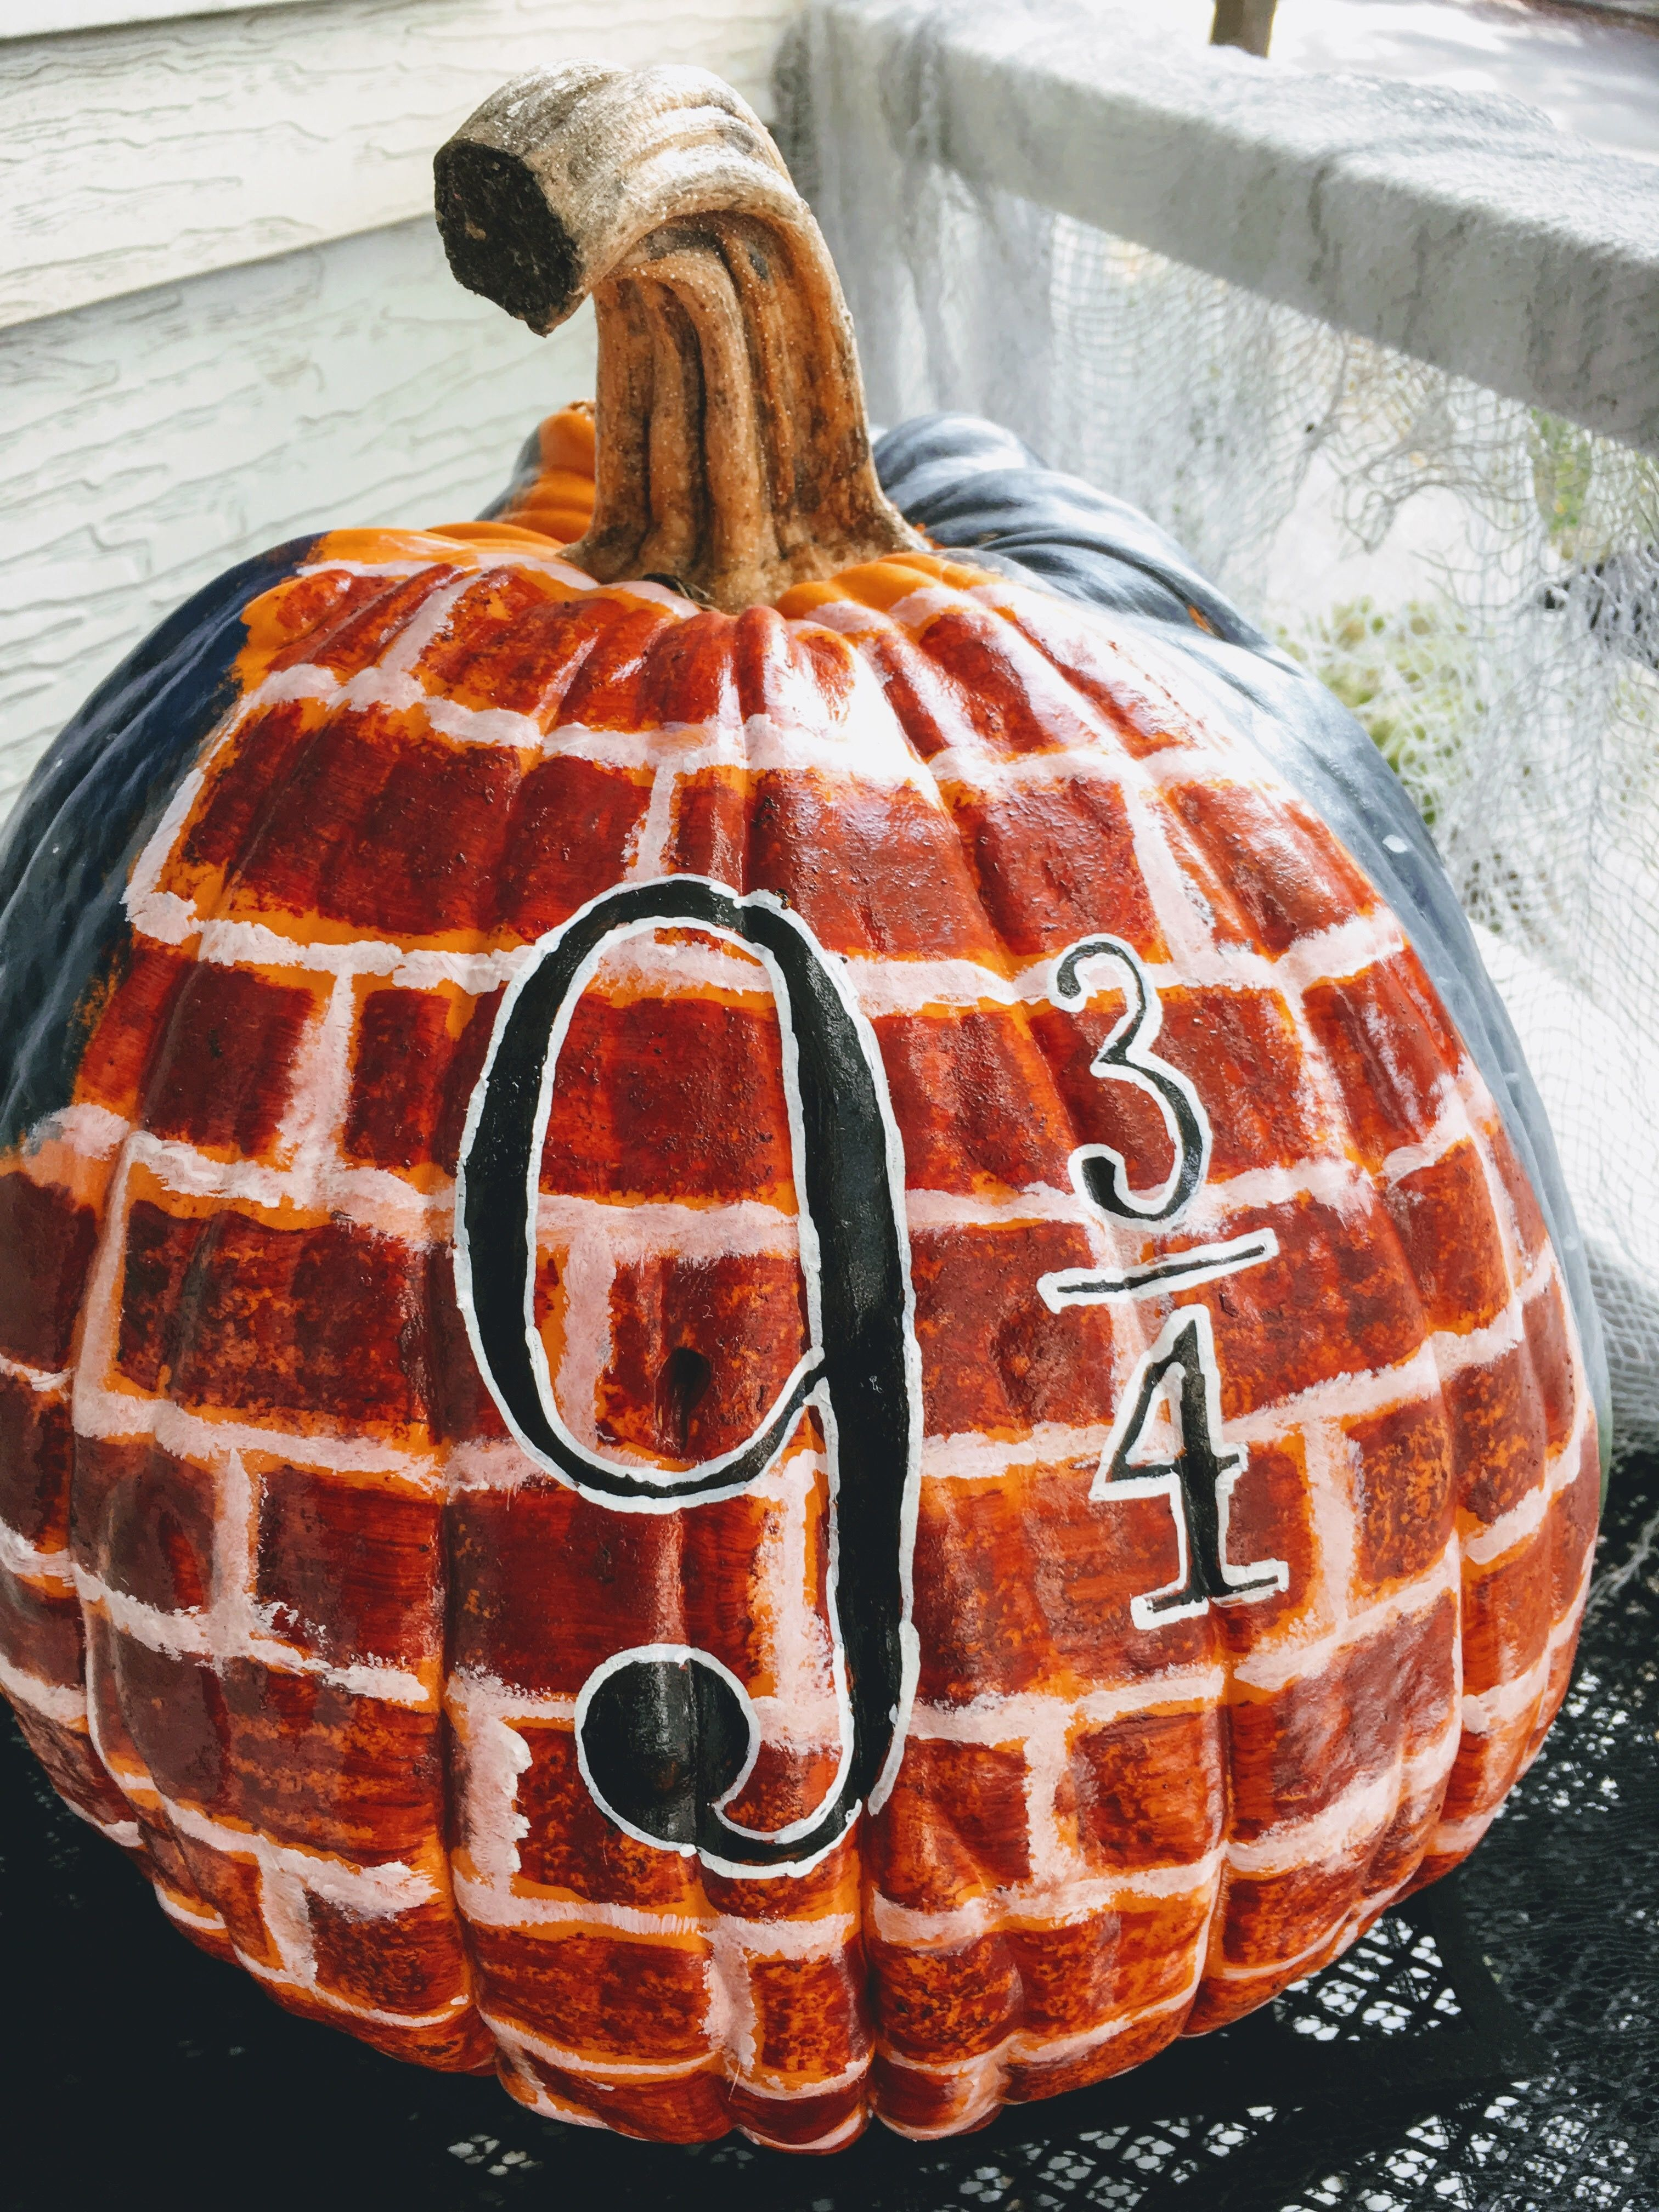 Harry Potter painted pumpkin by Megan Harry potter